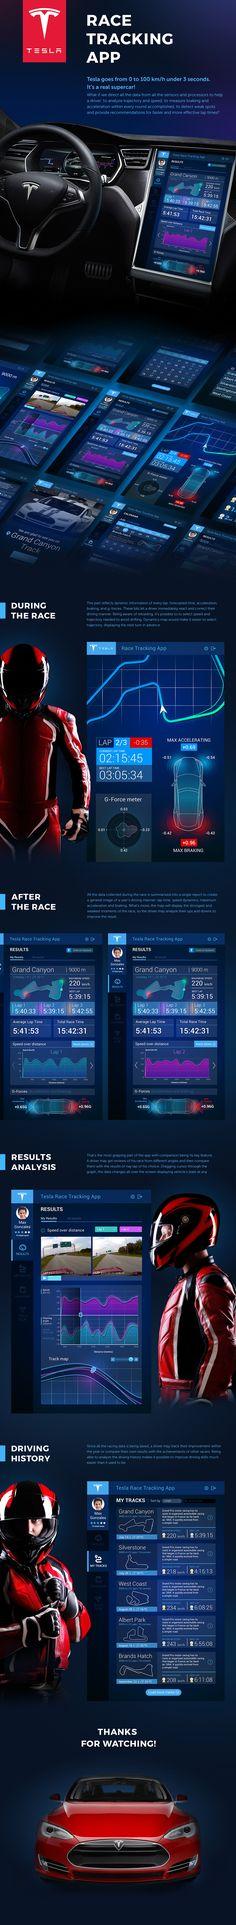 Tesla Race App Concept on Behance